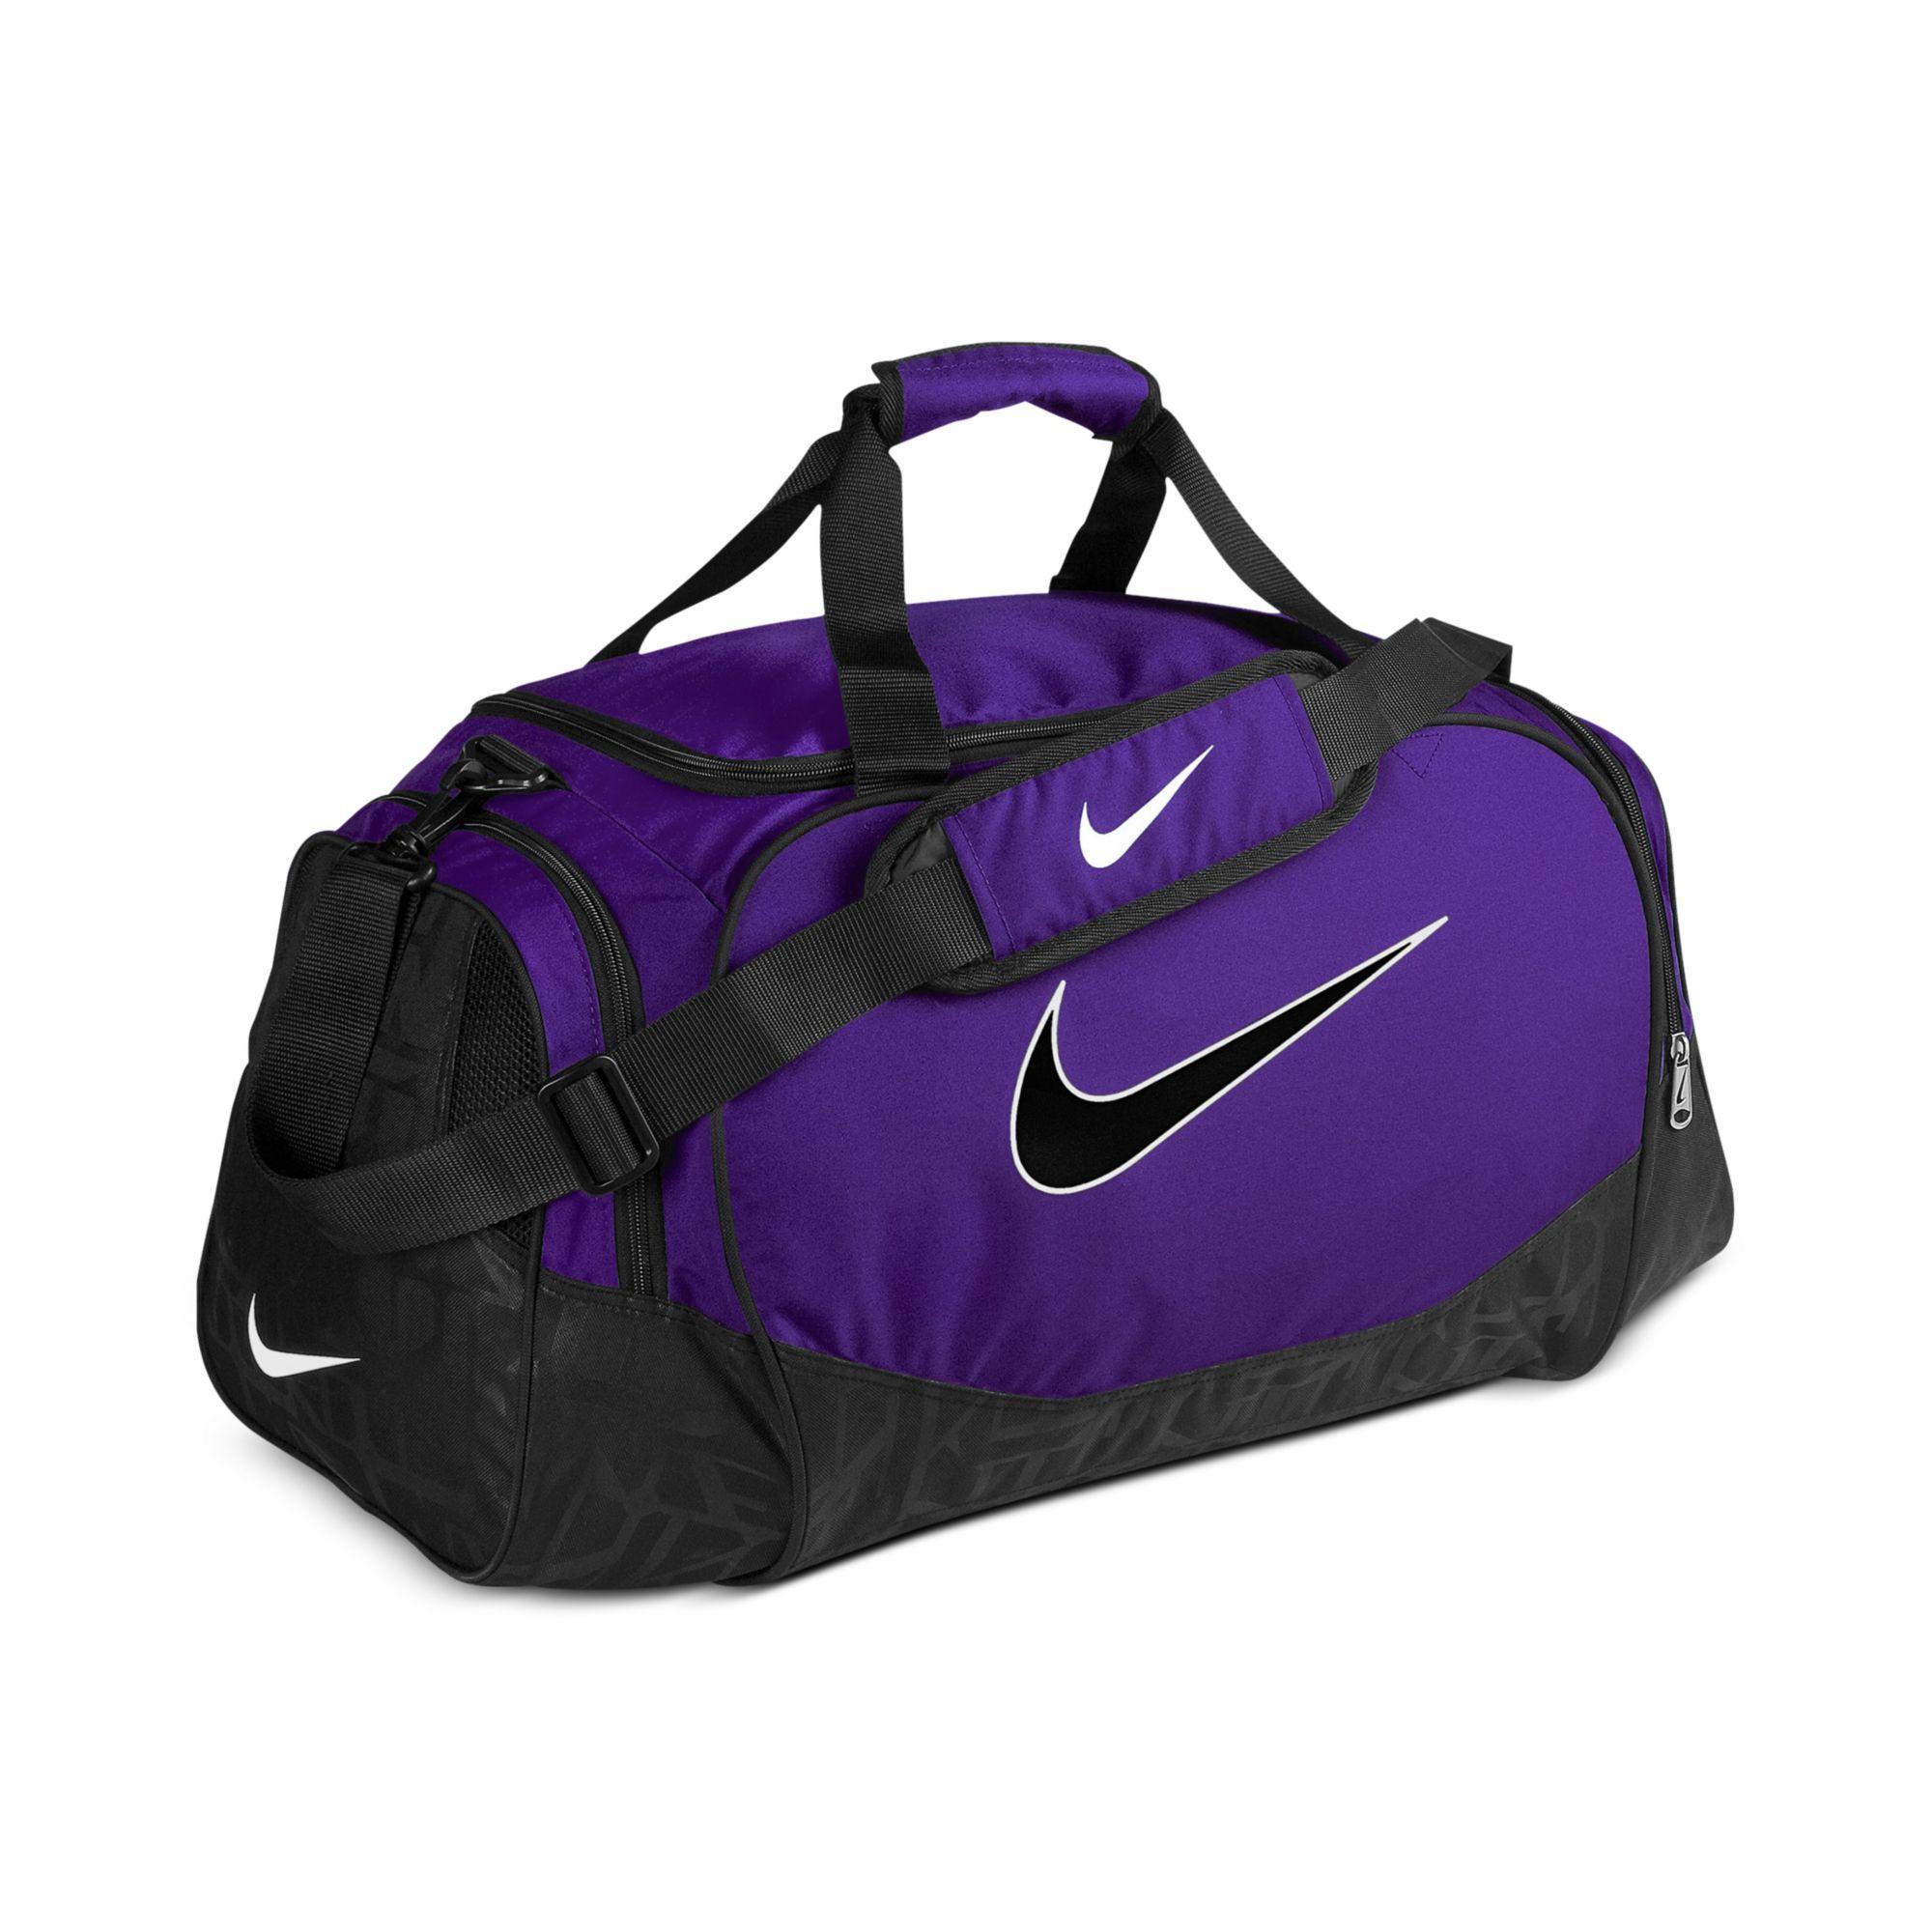 a9dc18585ef0 Lovely Lyst - Nike Medium Logo Duffle Bag in Purple for Men IW72